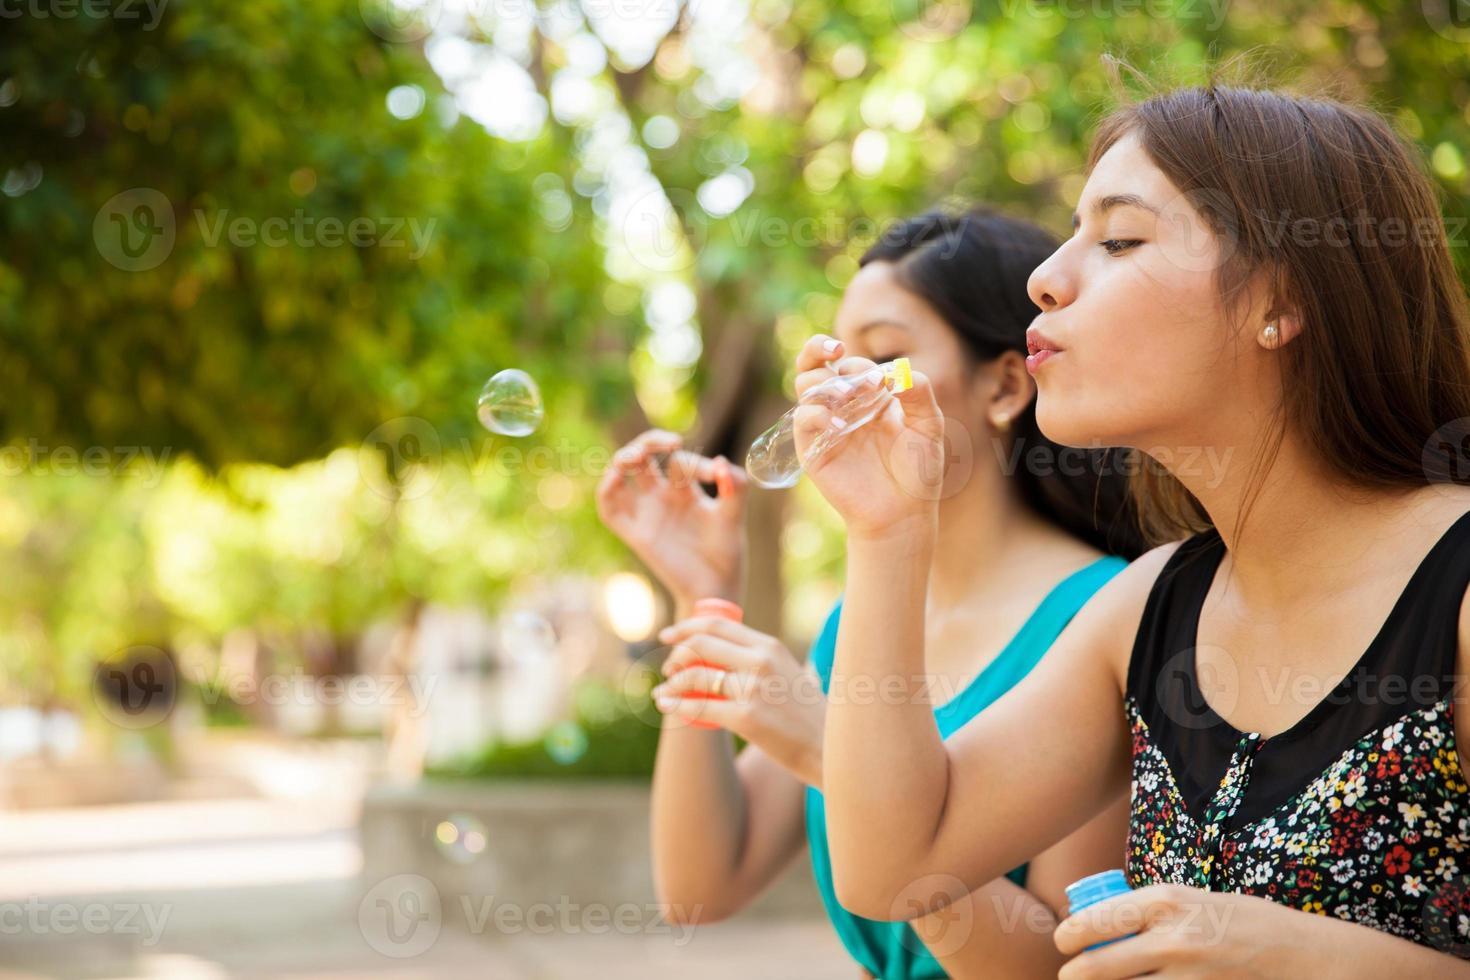 Blowing bubbles at a park photo